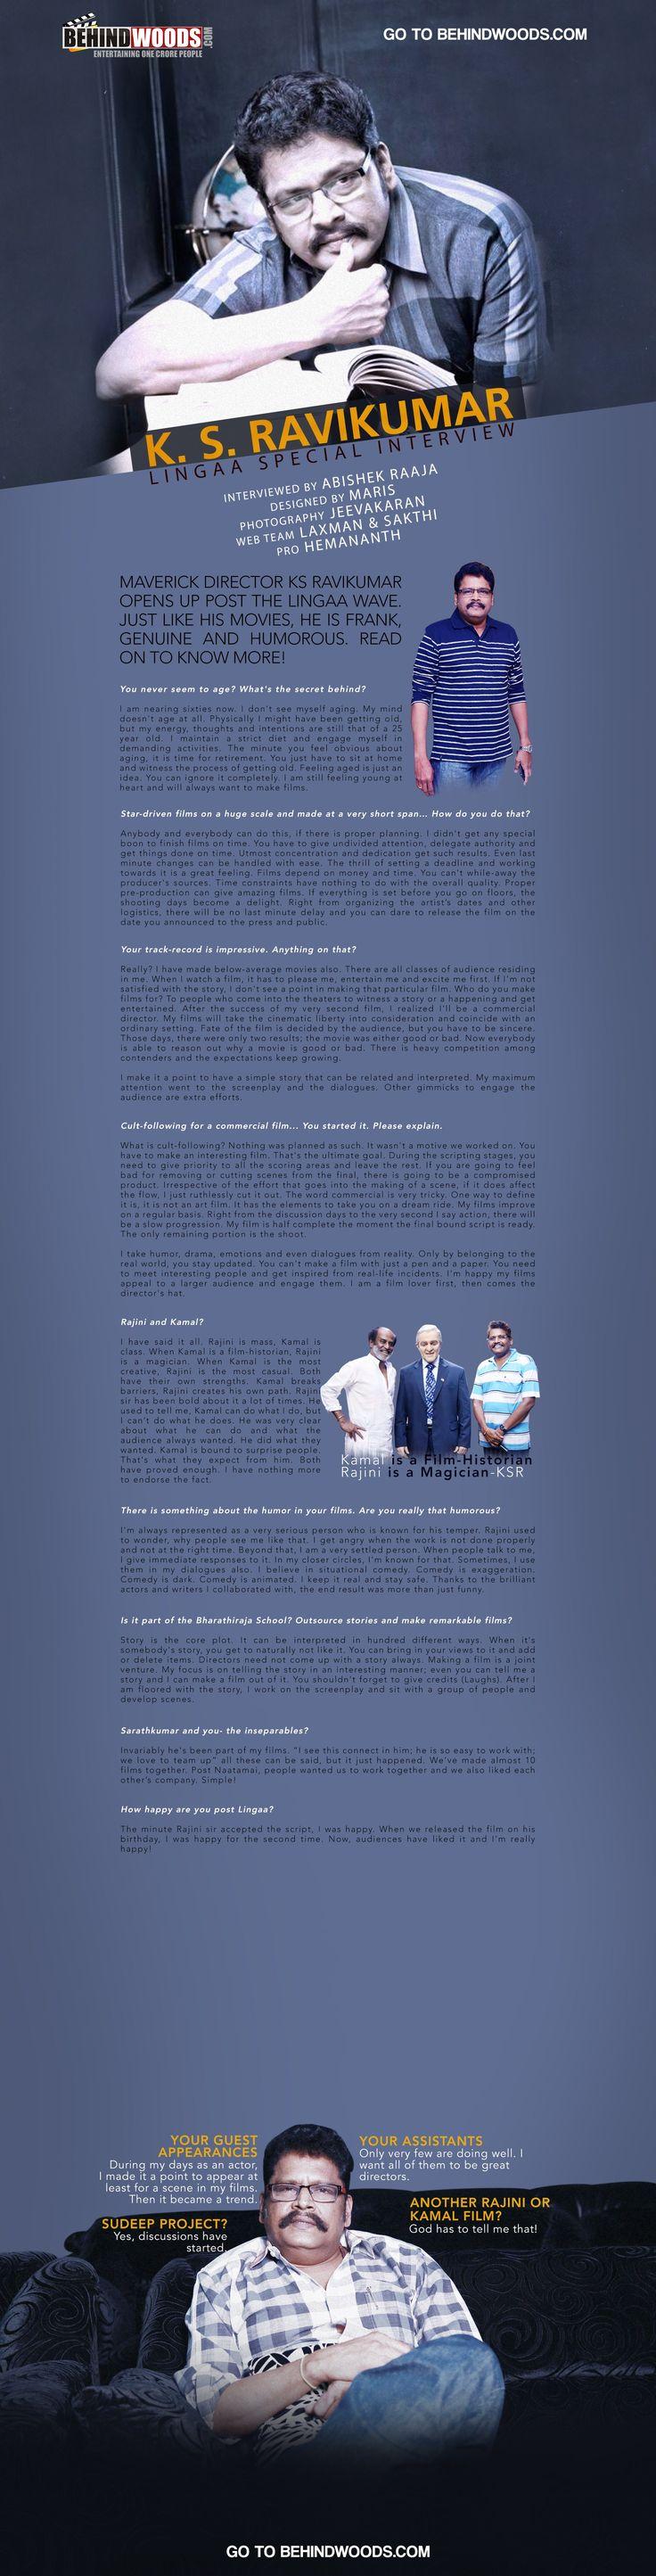 K.S.Ravikumar Special Interview